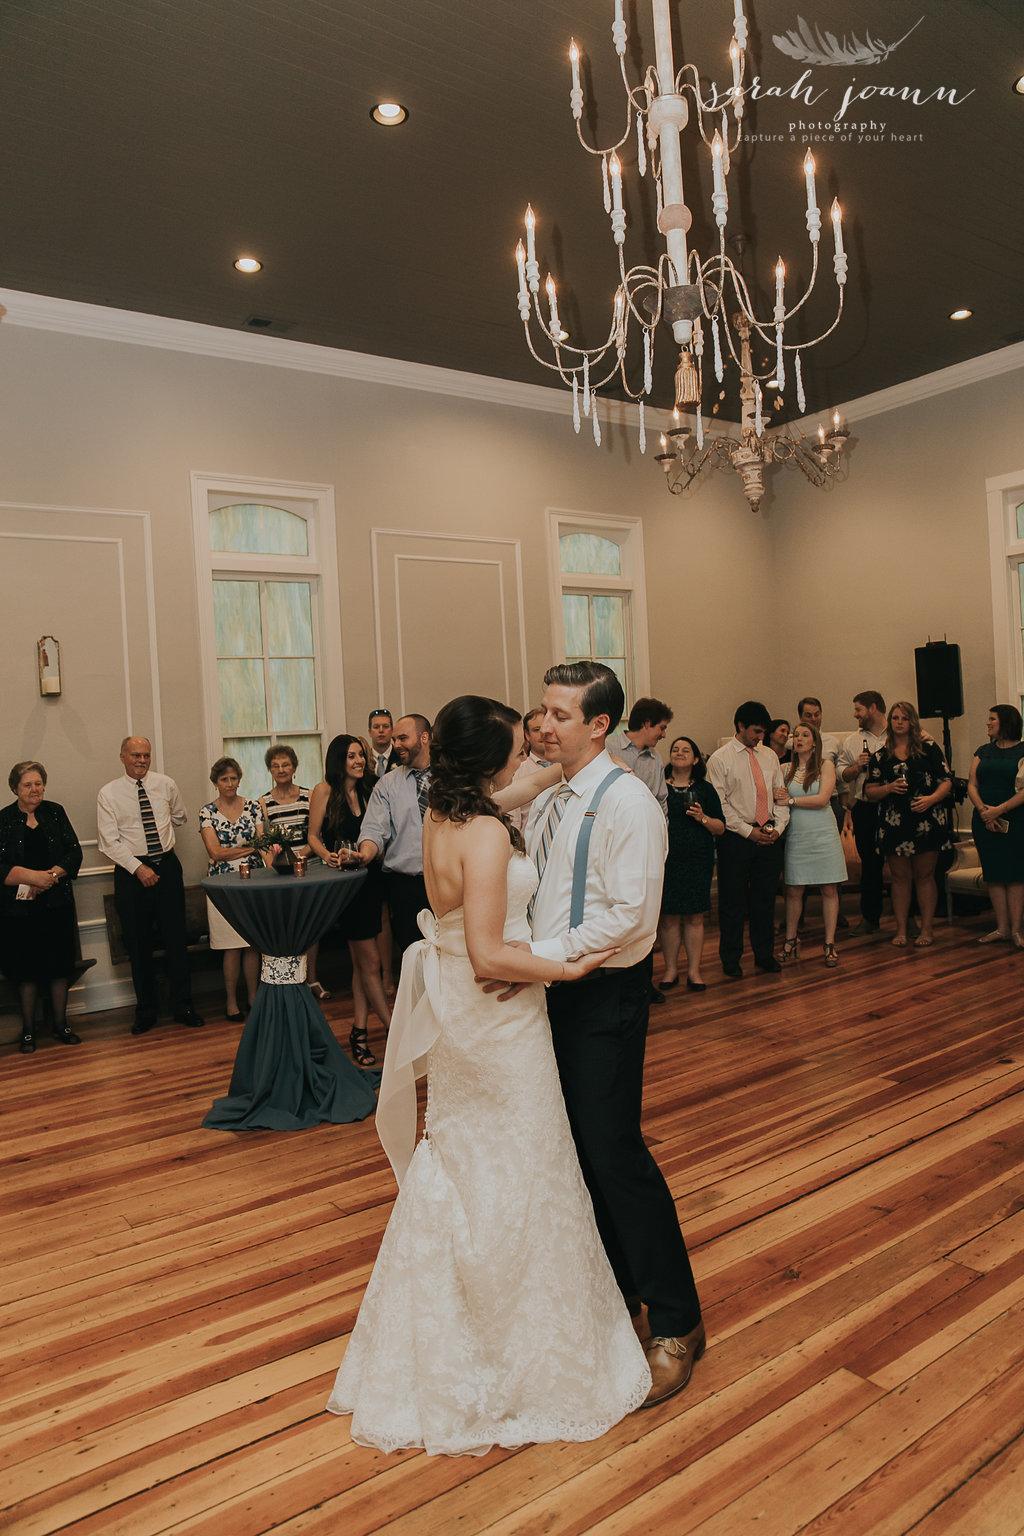 the-Parlour-wedding-photographer-B&B-IMG_77751652.jpg